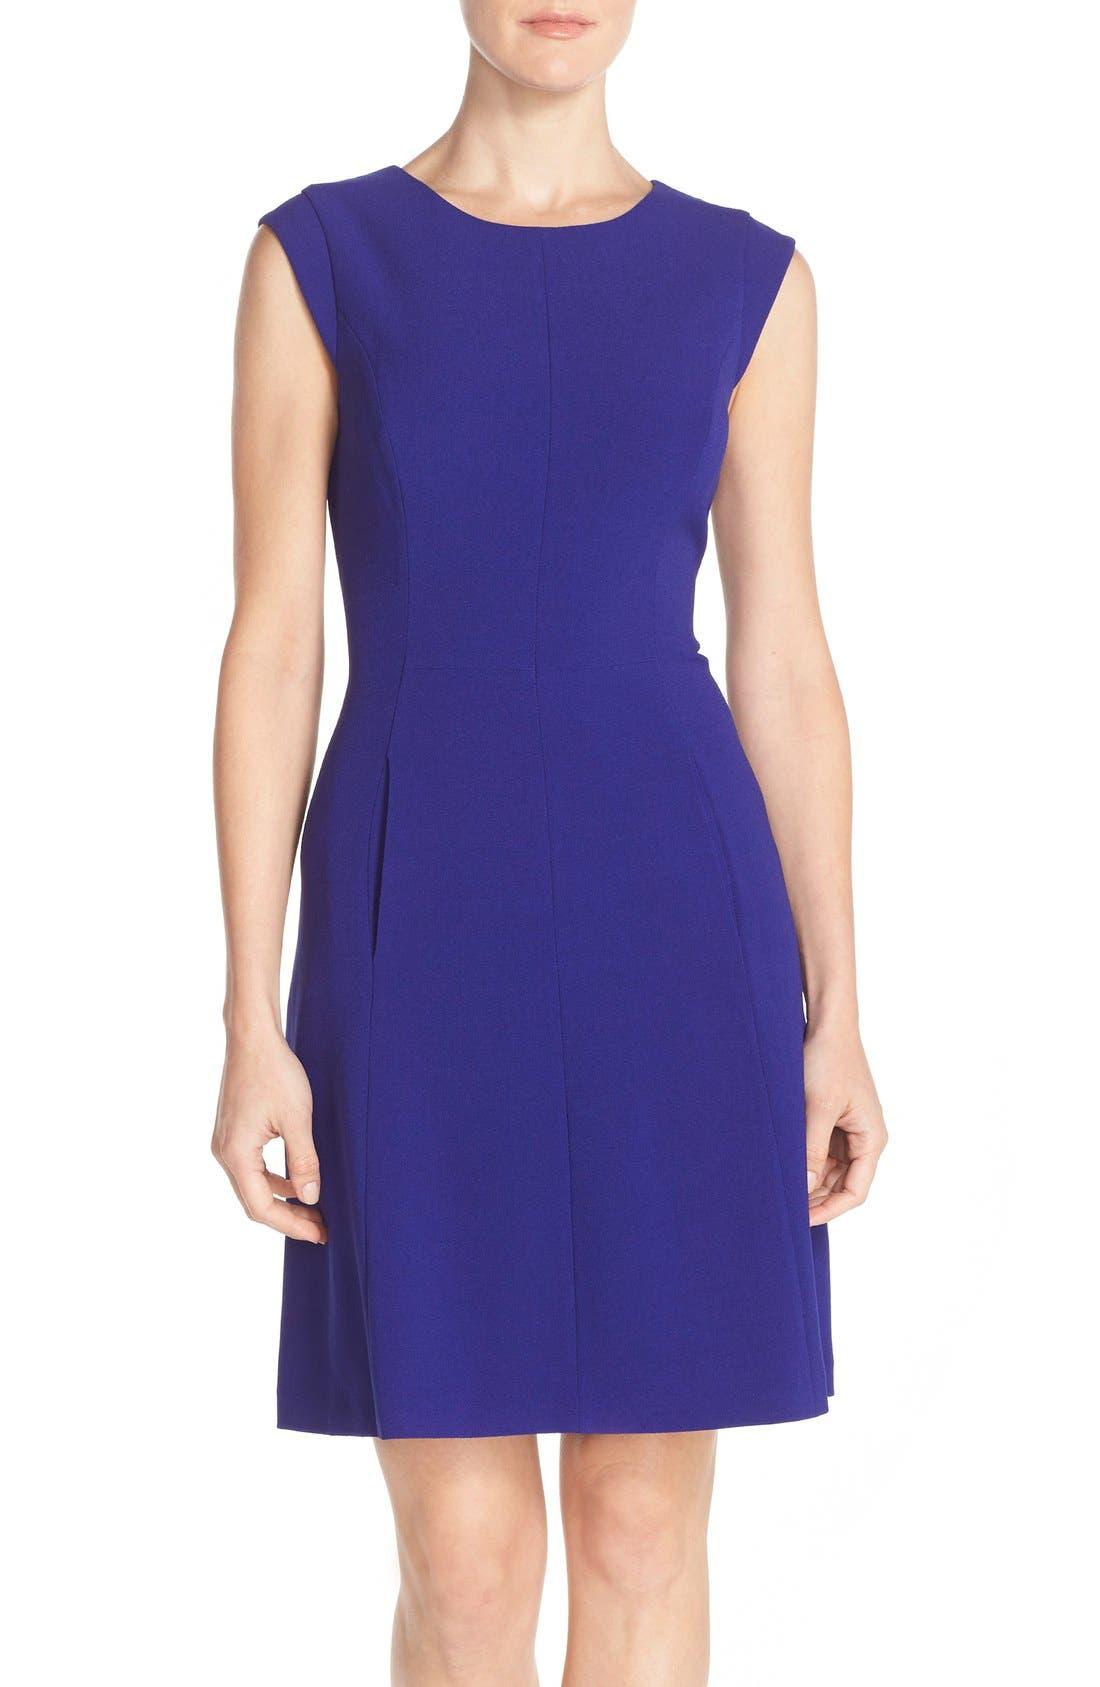 Alternate Image 1 Selected - Vince Camuto Seamed Crepe Fit & Flare Dress (Regular & Petite)